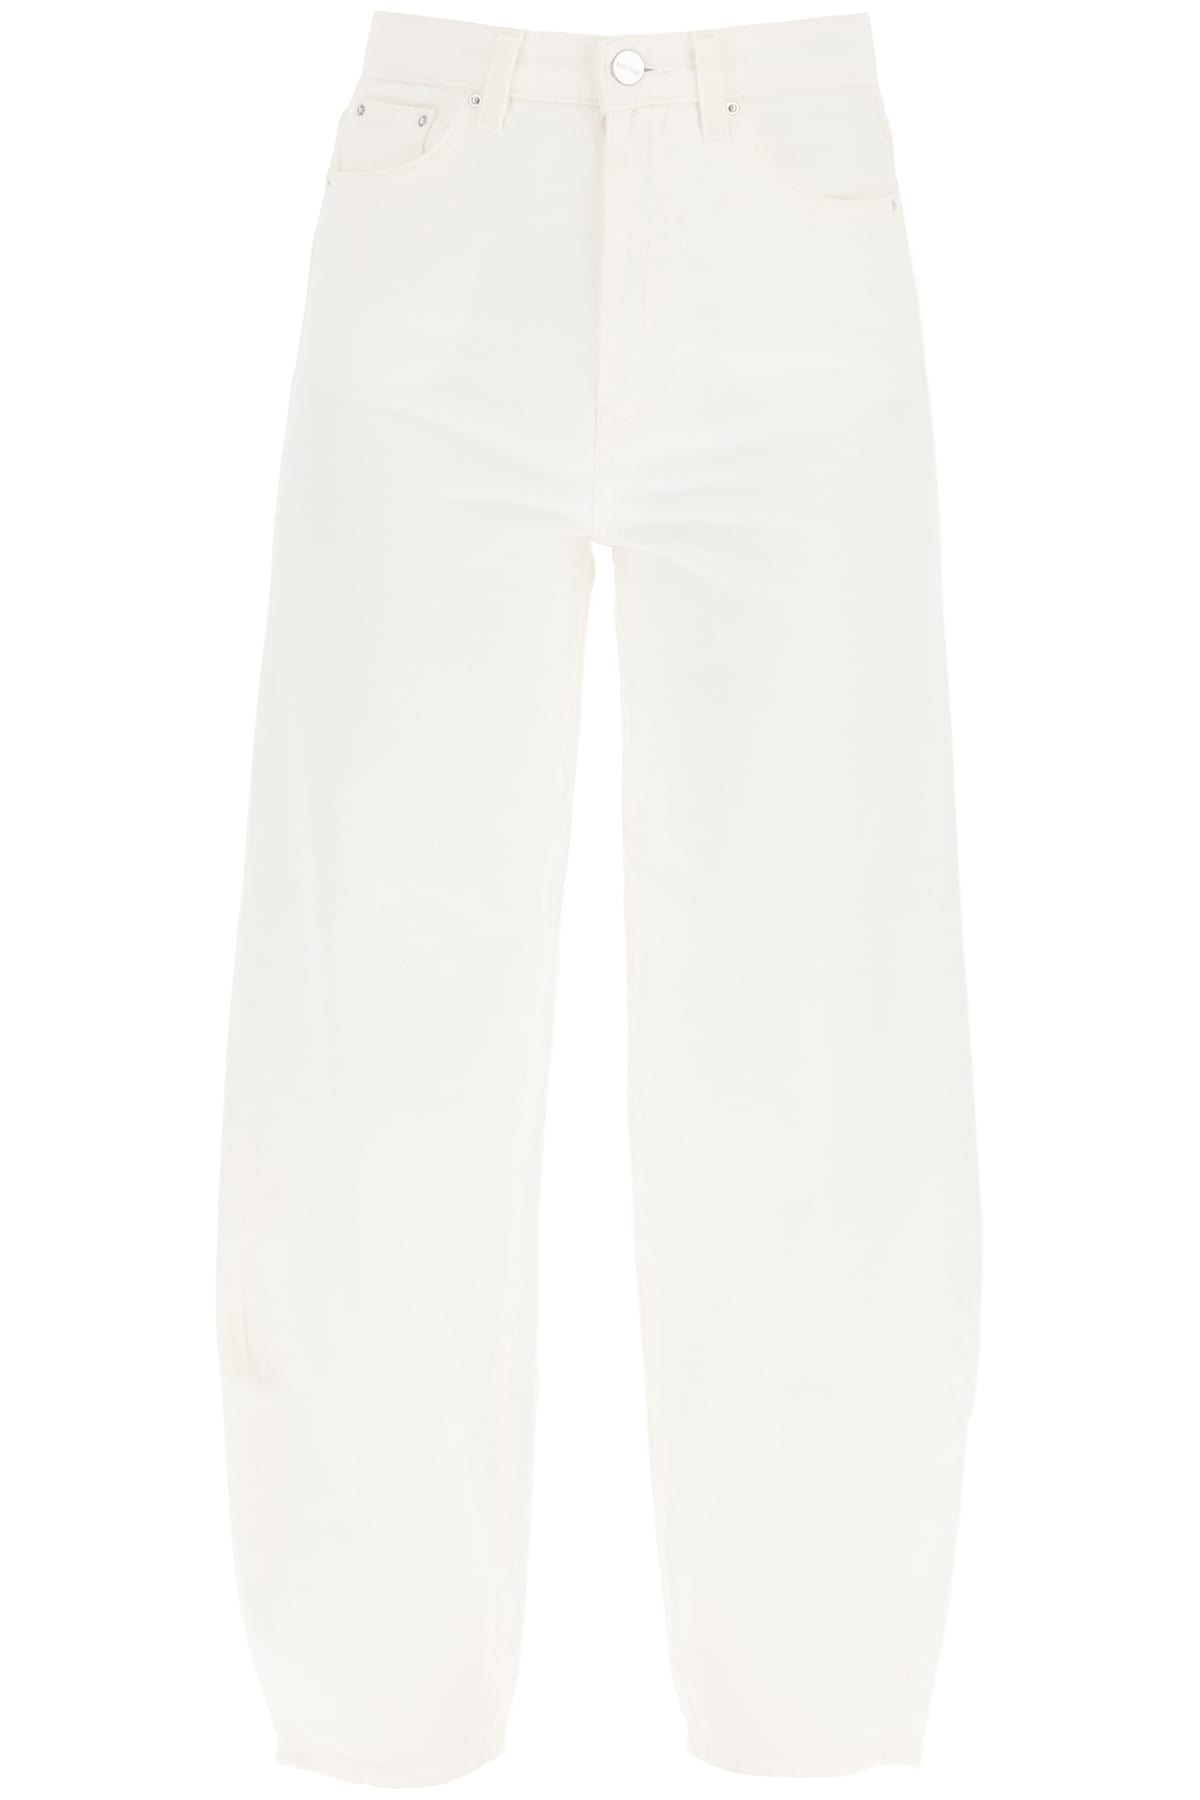 Totême Barrel Jeans